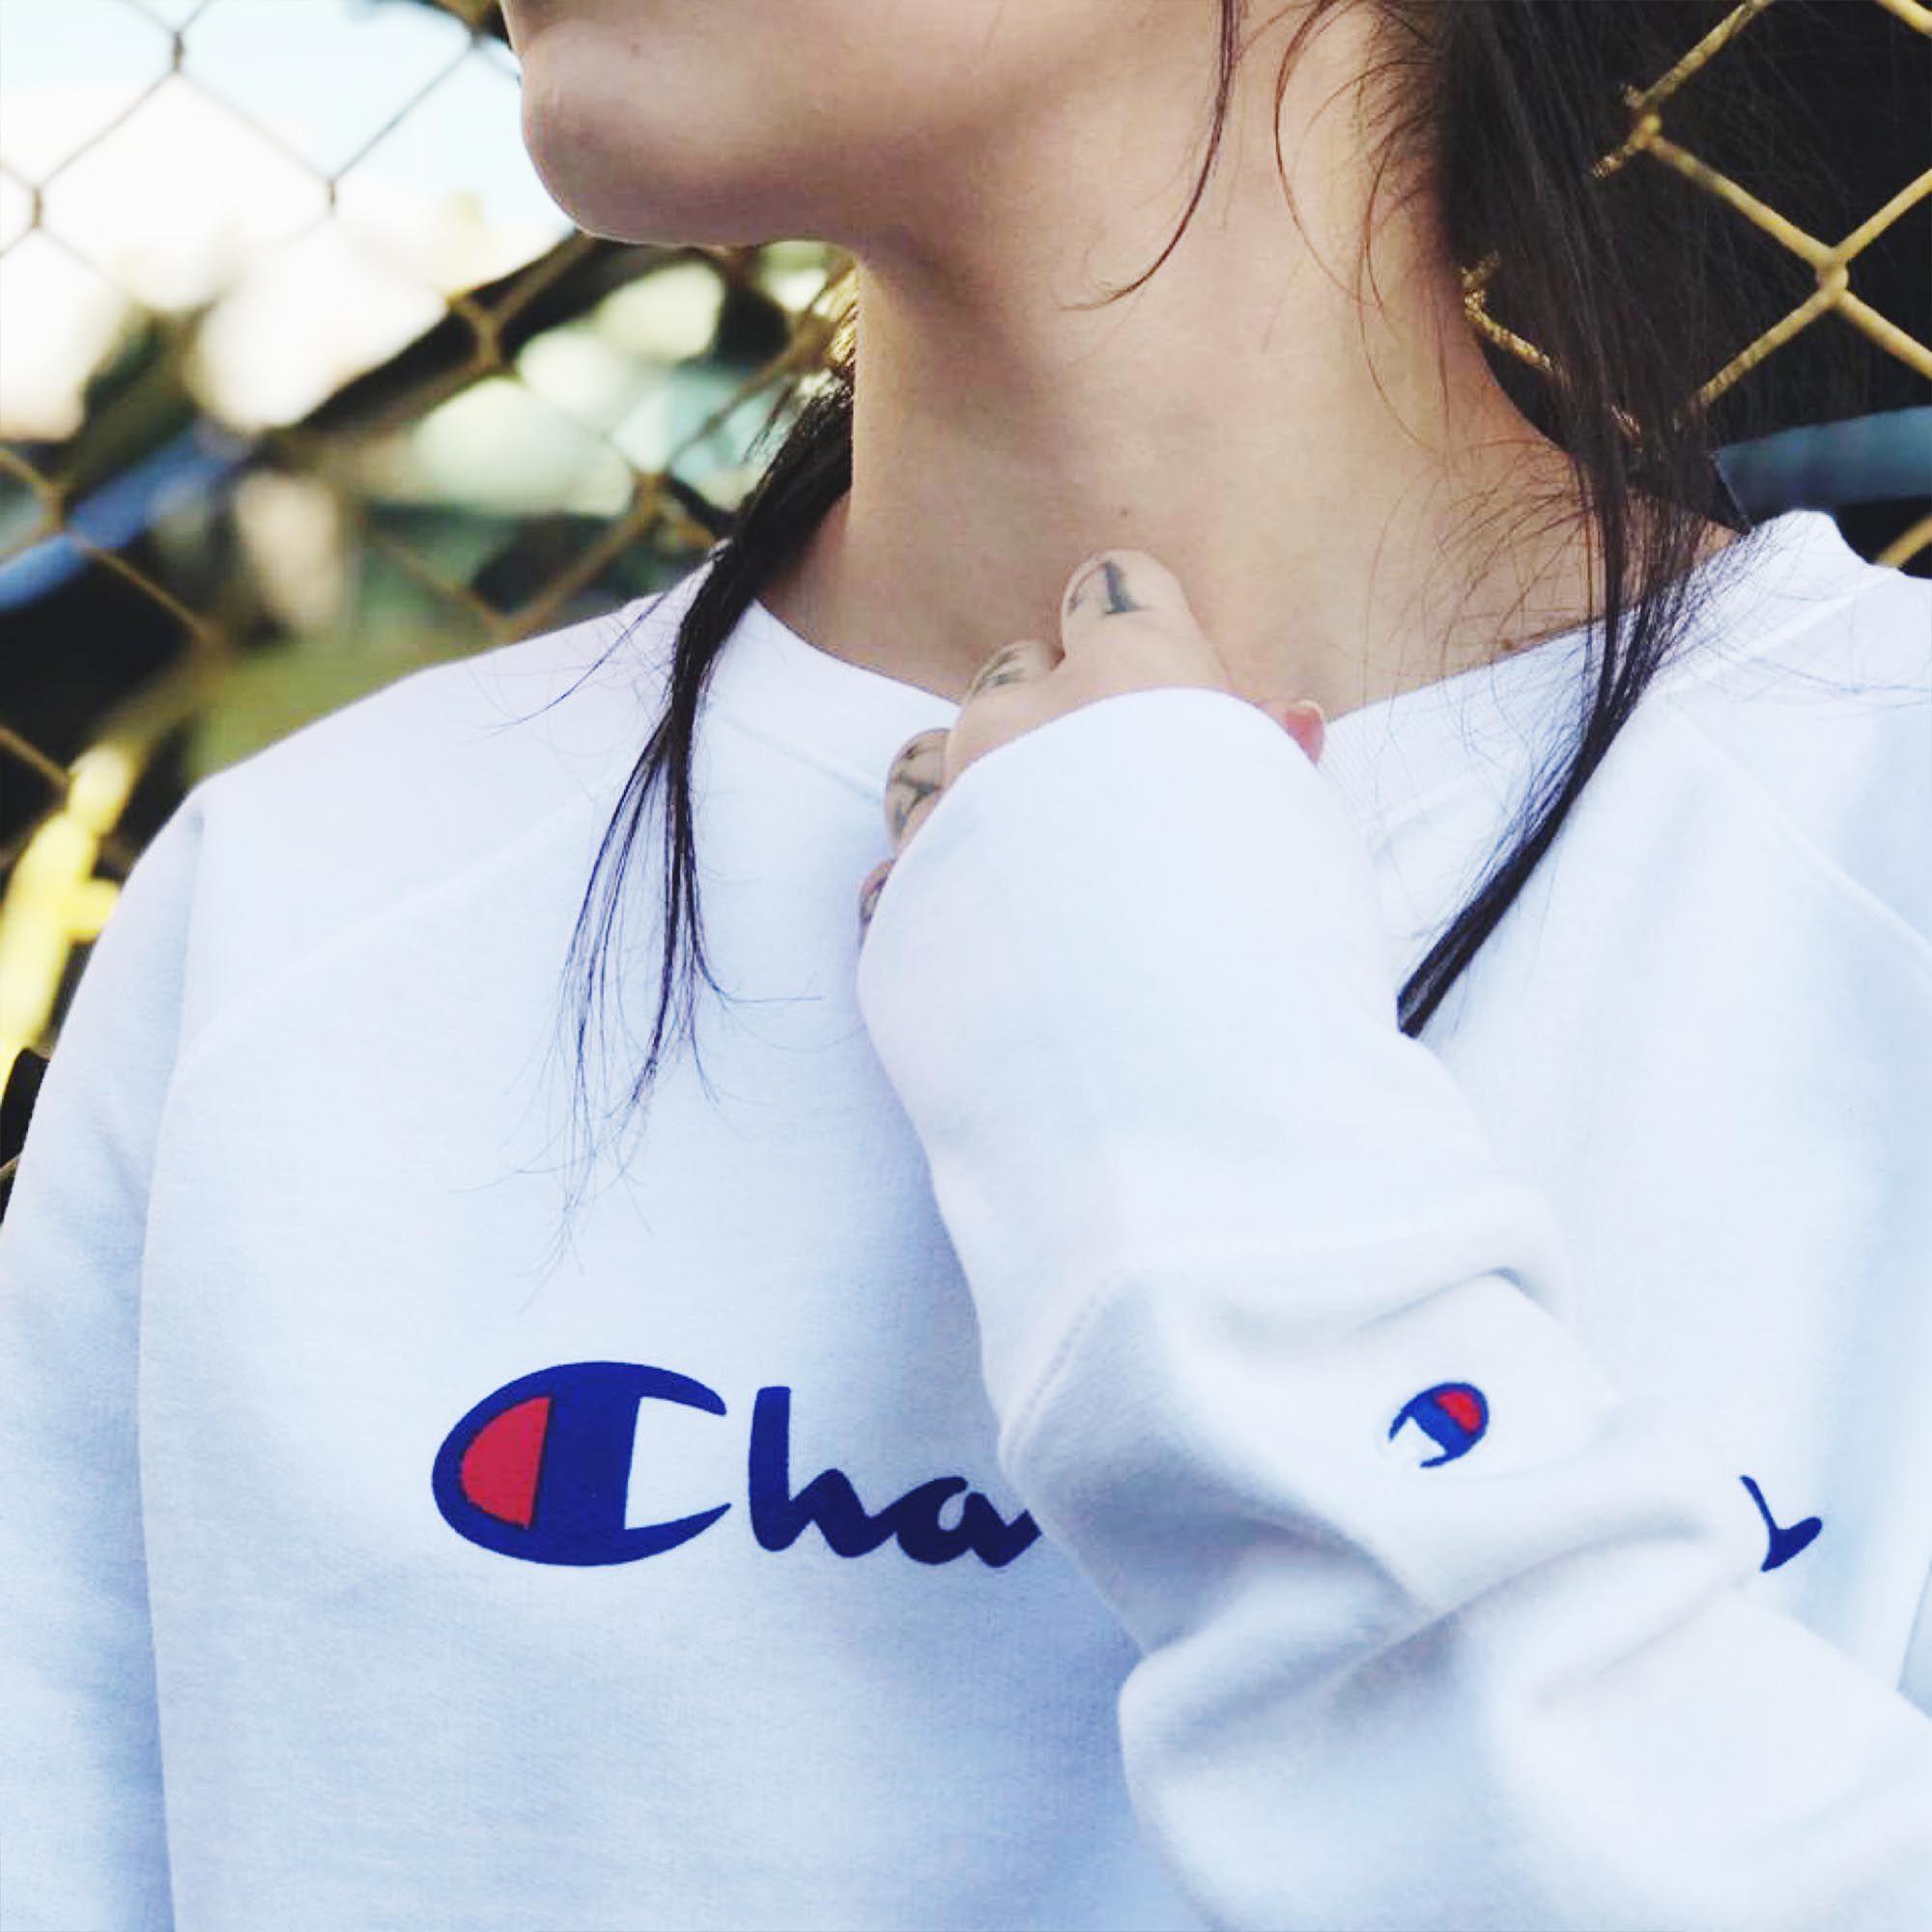 e99c43dcaf [blacksheet_store] [camiseta_feminina] [tênis] [adidas_originals] [adidas]  [fila] [vans] [high] [diamond] [starter] [grizzly]